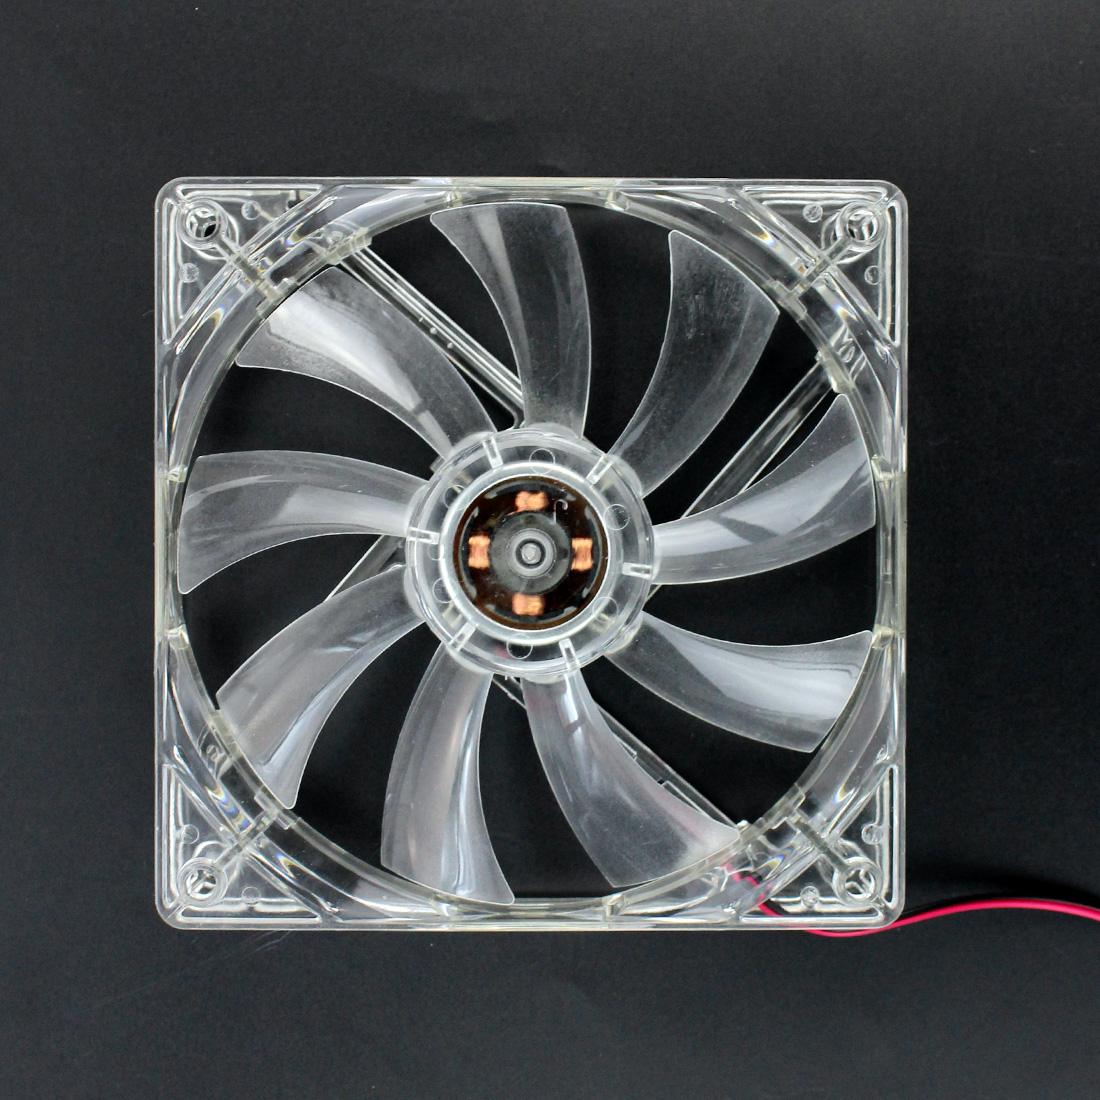 XT-XINTE Large 4Pin 12cm PC Computer fan Cooler  20dBA 12V DC Heatsink for